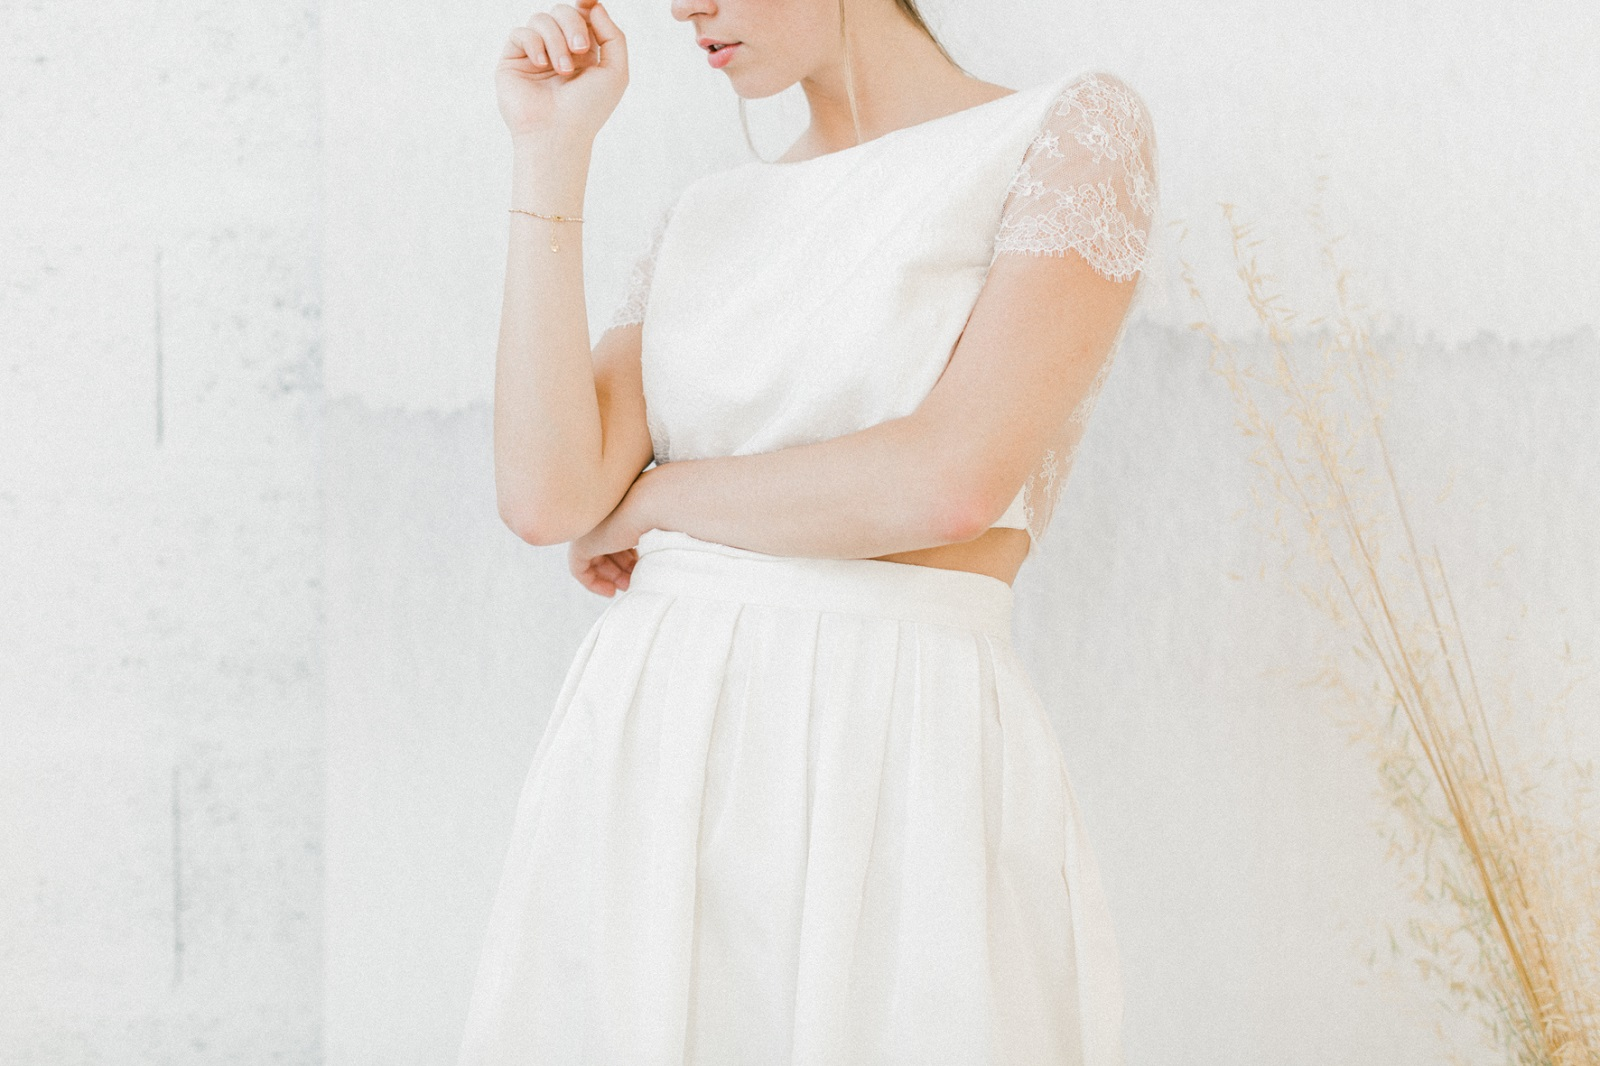 creatrice robe mariee Pays de Loire